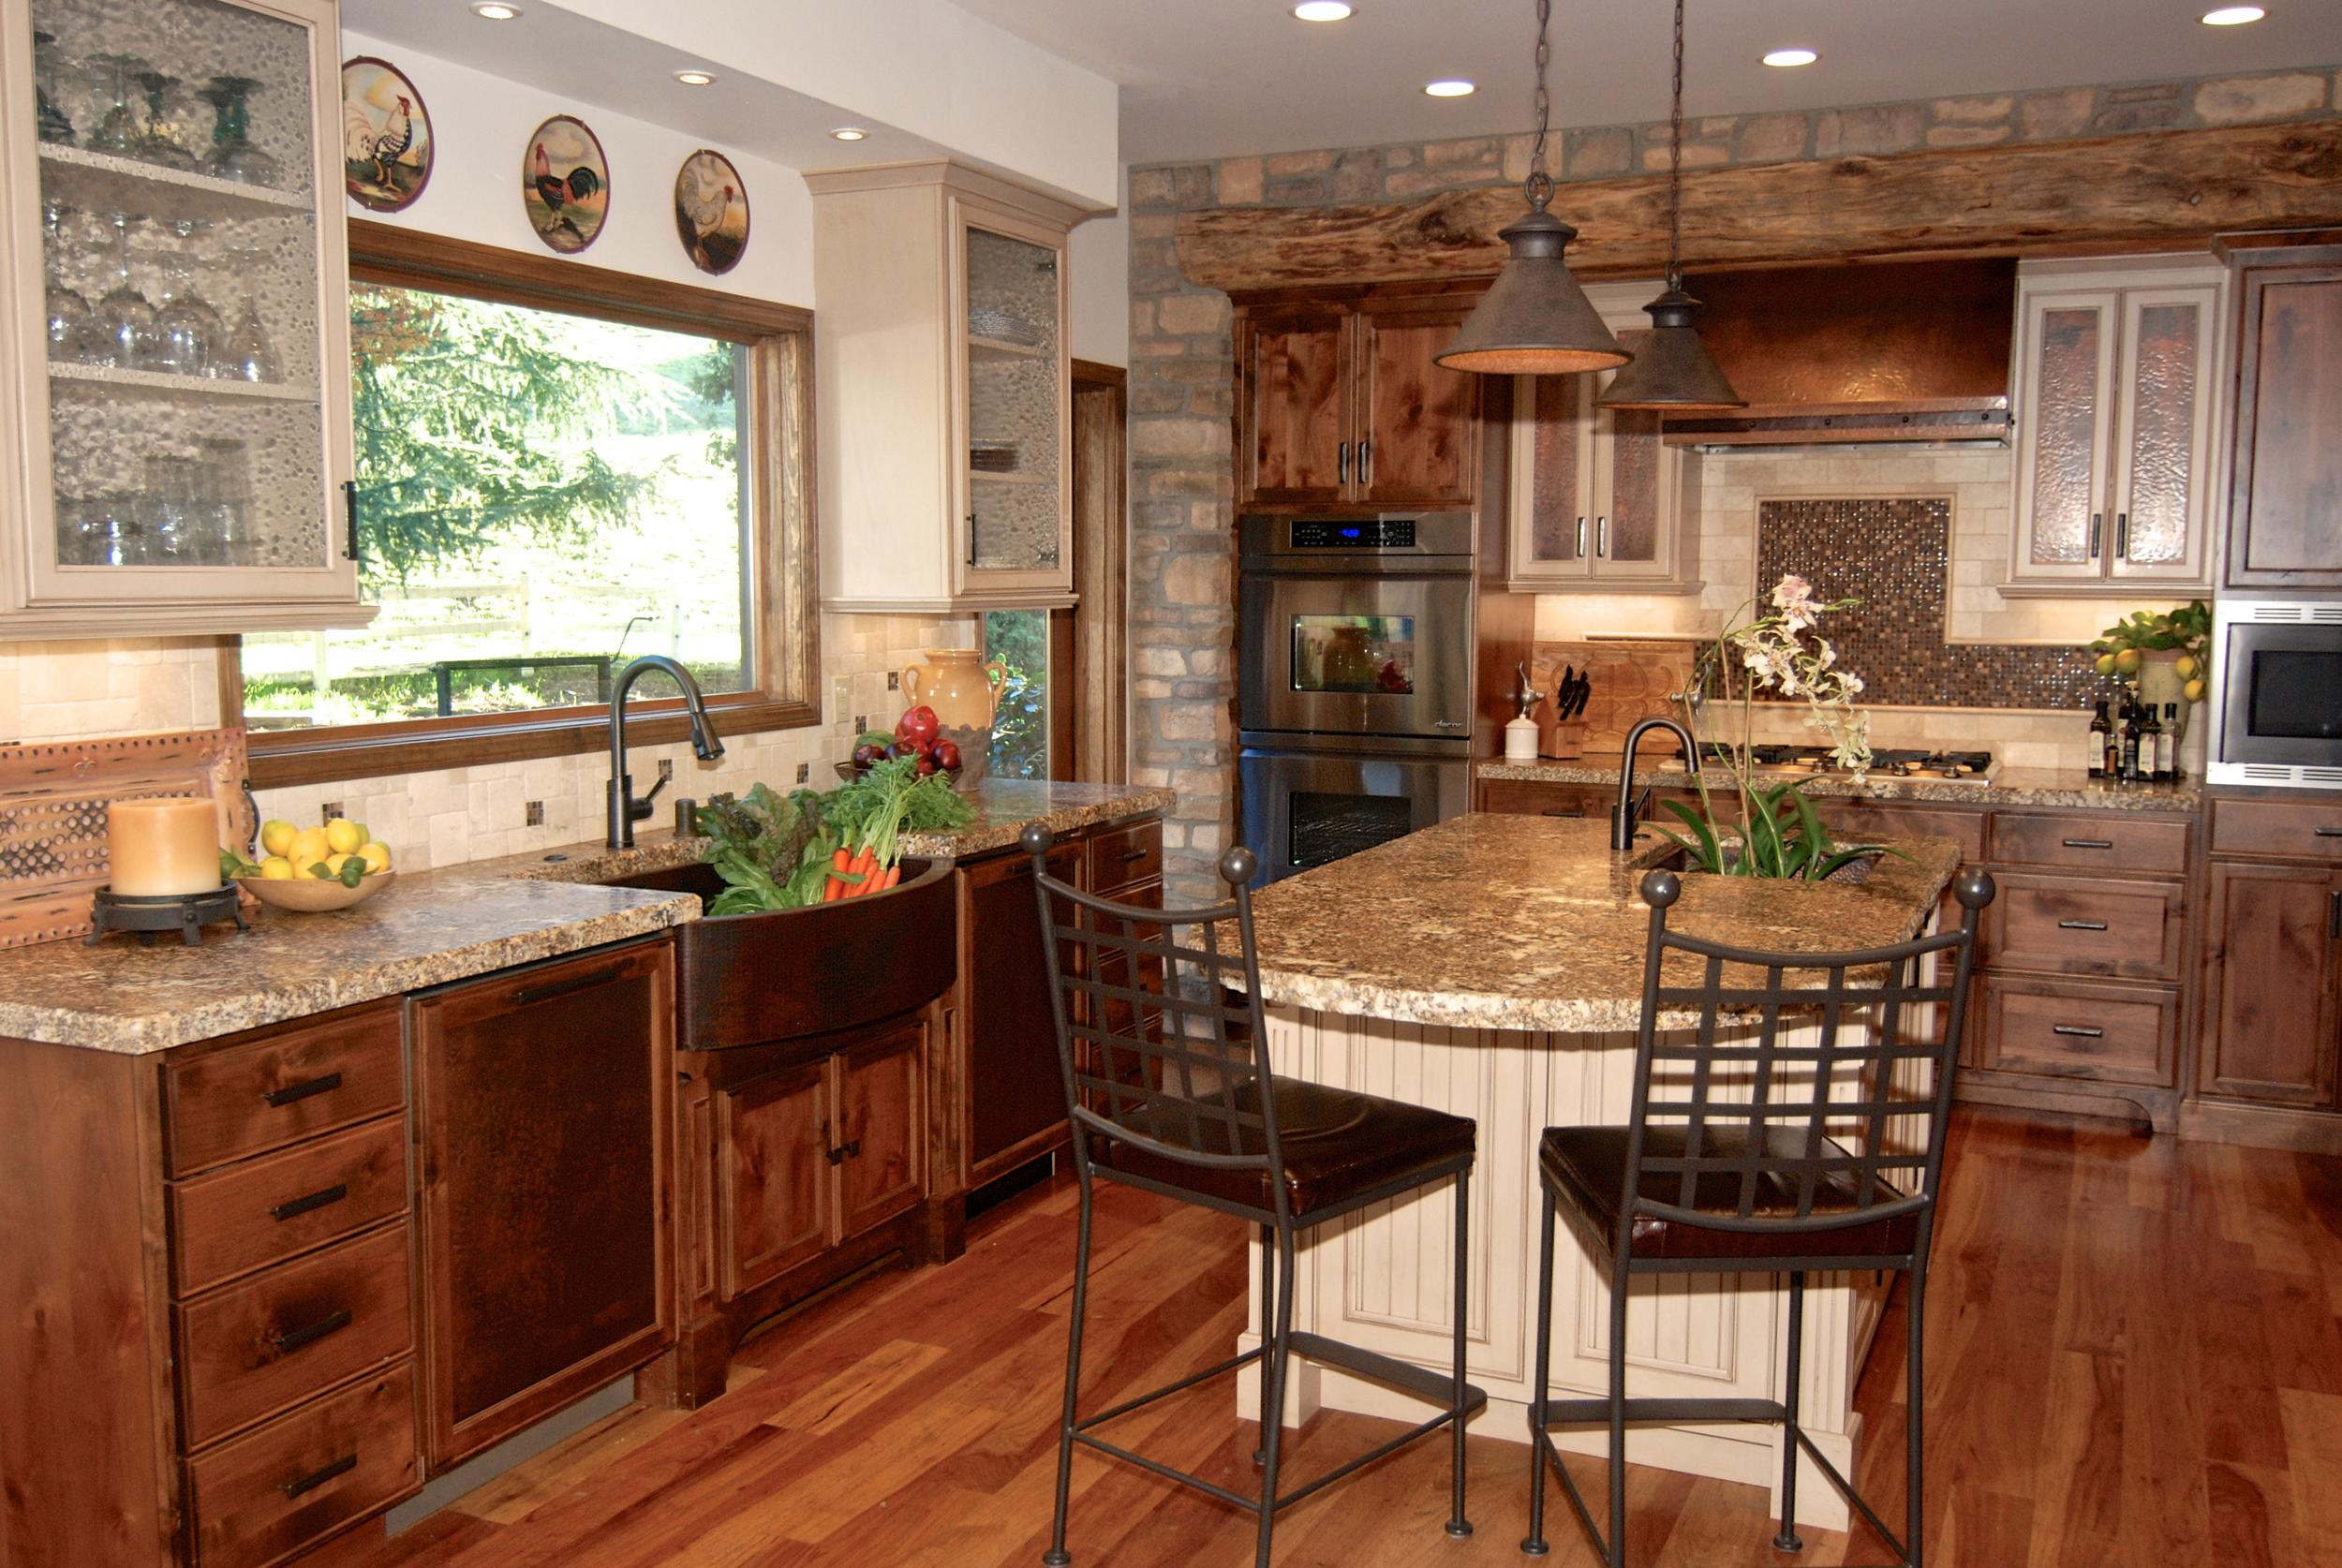 farm apron sink granite island and bar chairs